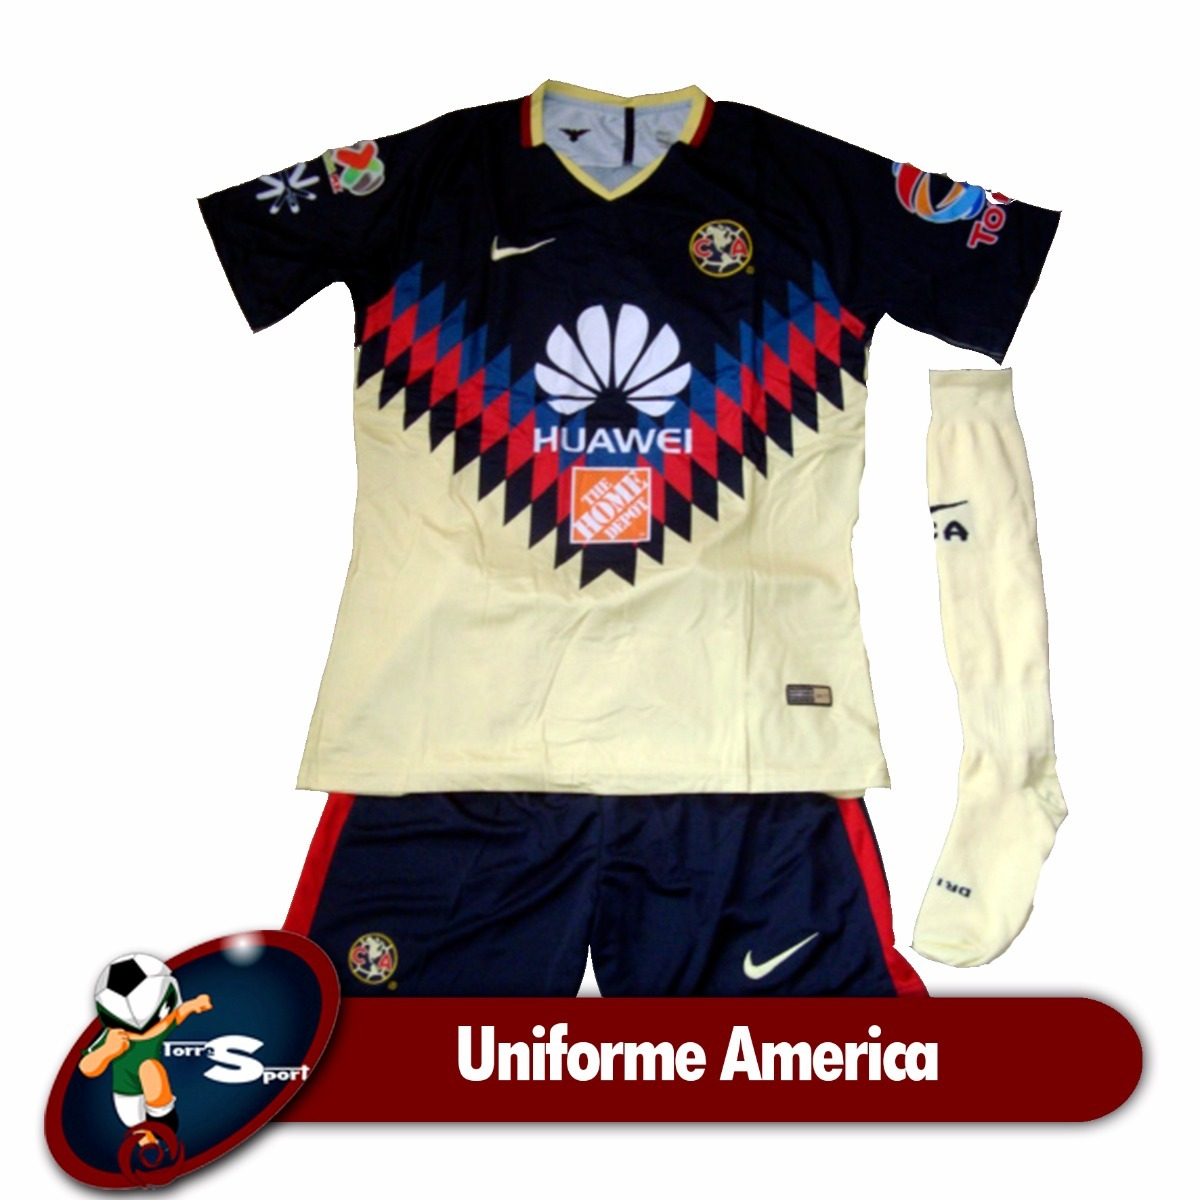 929cefe6bcba3 uniformes de futbol originales liga mx clubes 2017 2018. Cargando zoom.